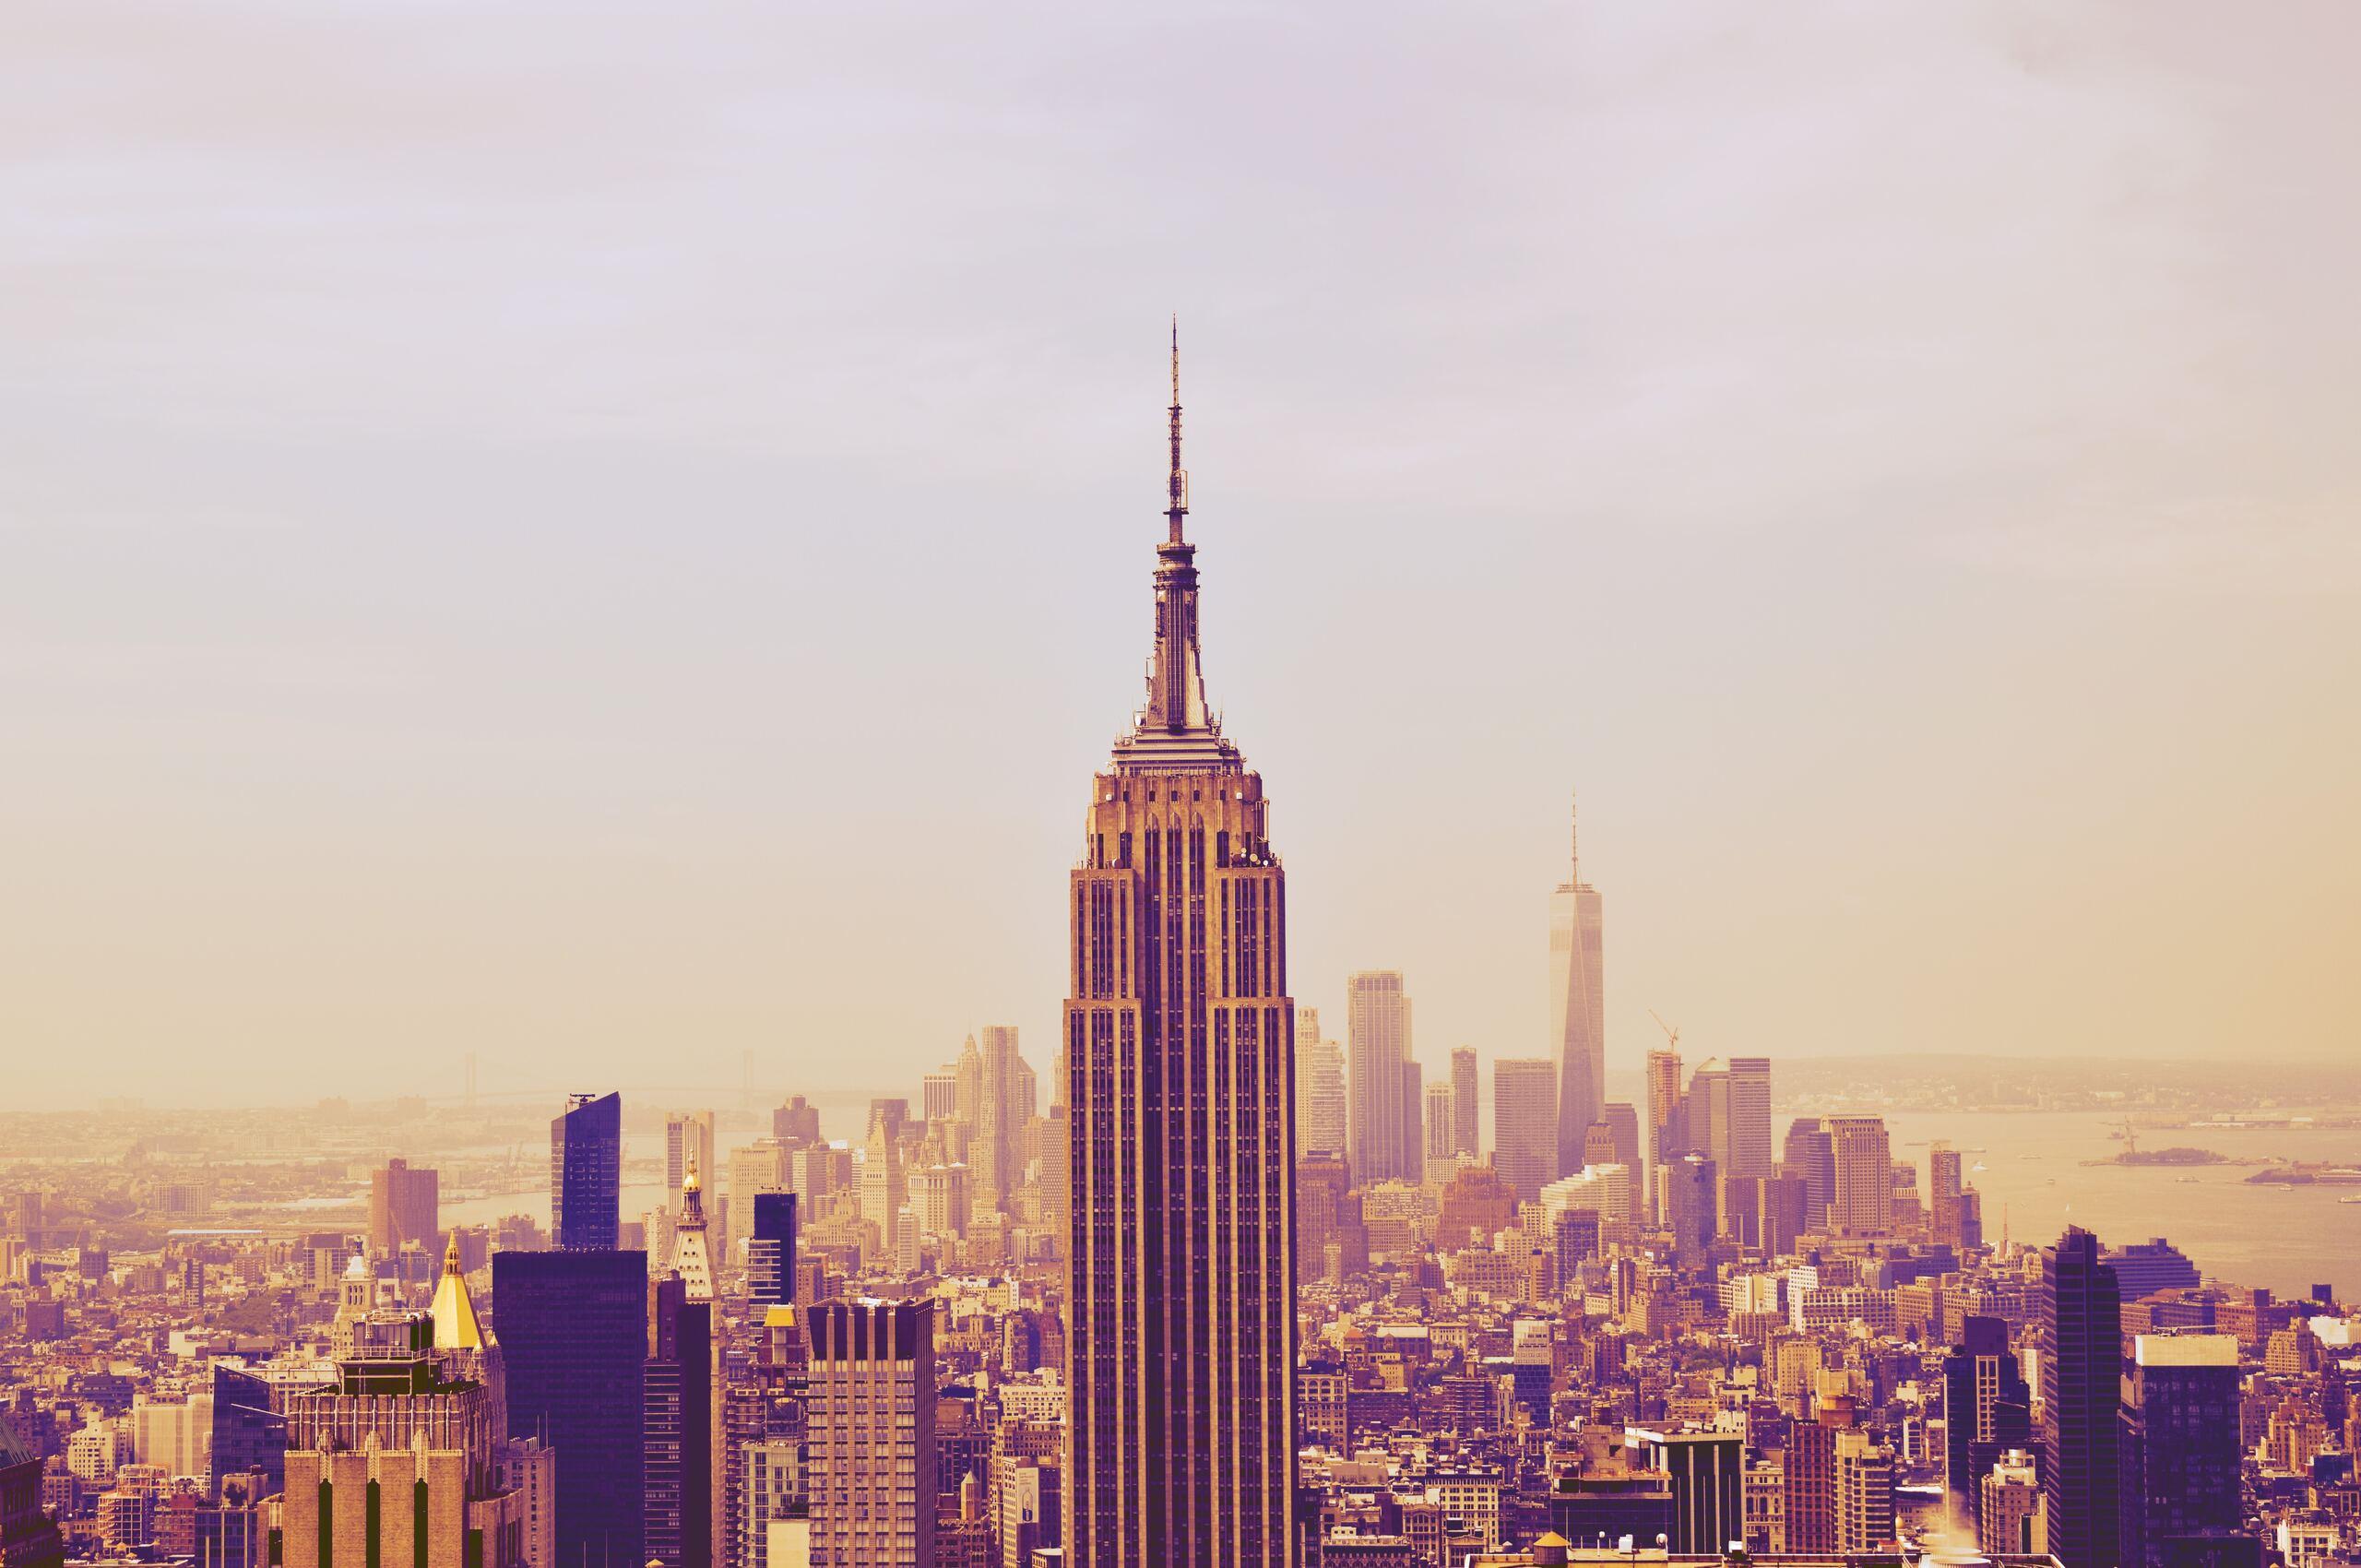 empire-state-building-new-york-5k-7p.jpg